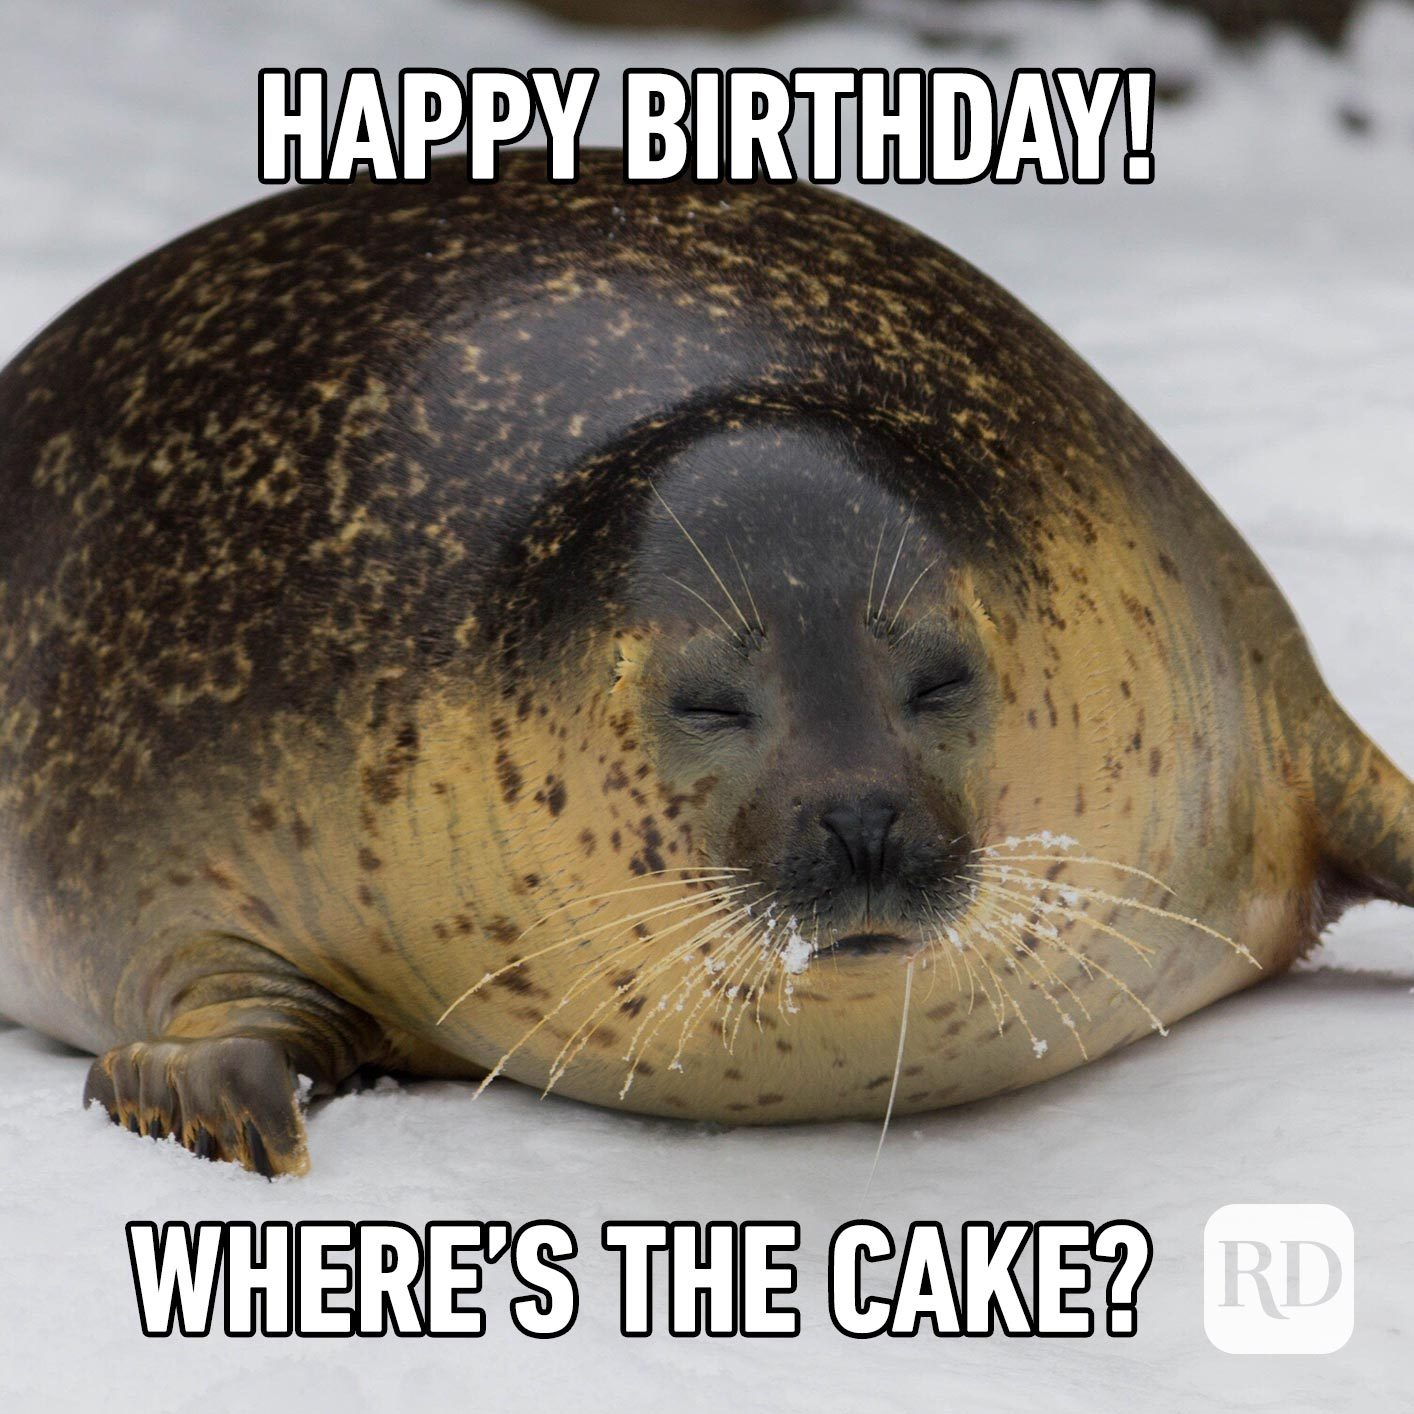 Happy Birthday! Where's the cake?